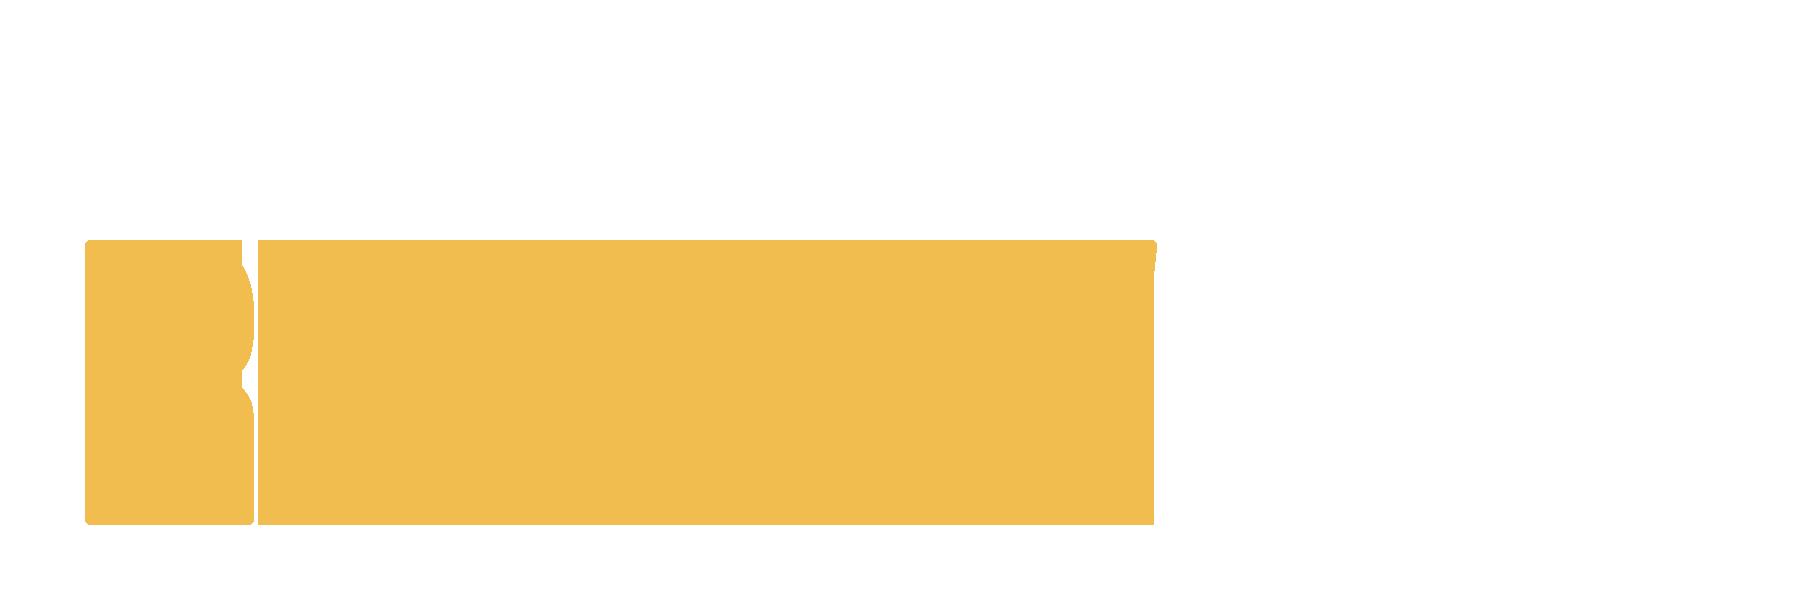 Review Management - Rinard Media | Effective Marketing Strategies